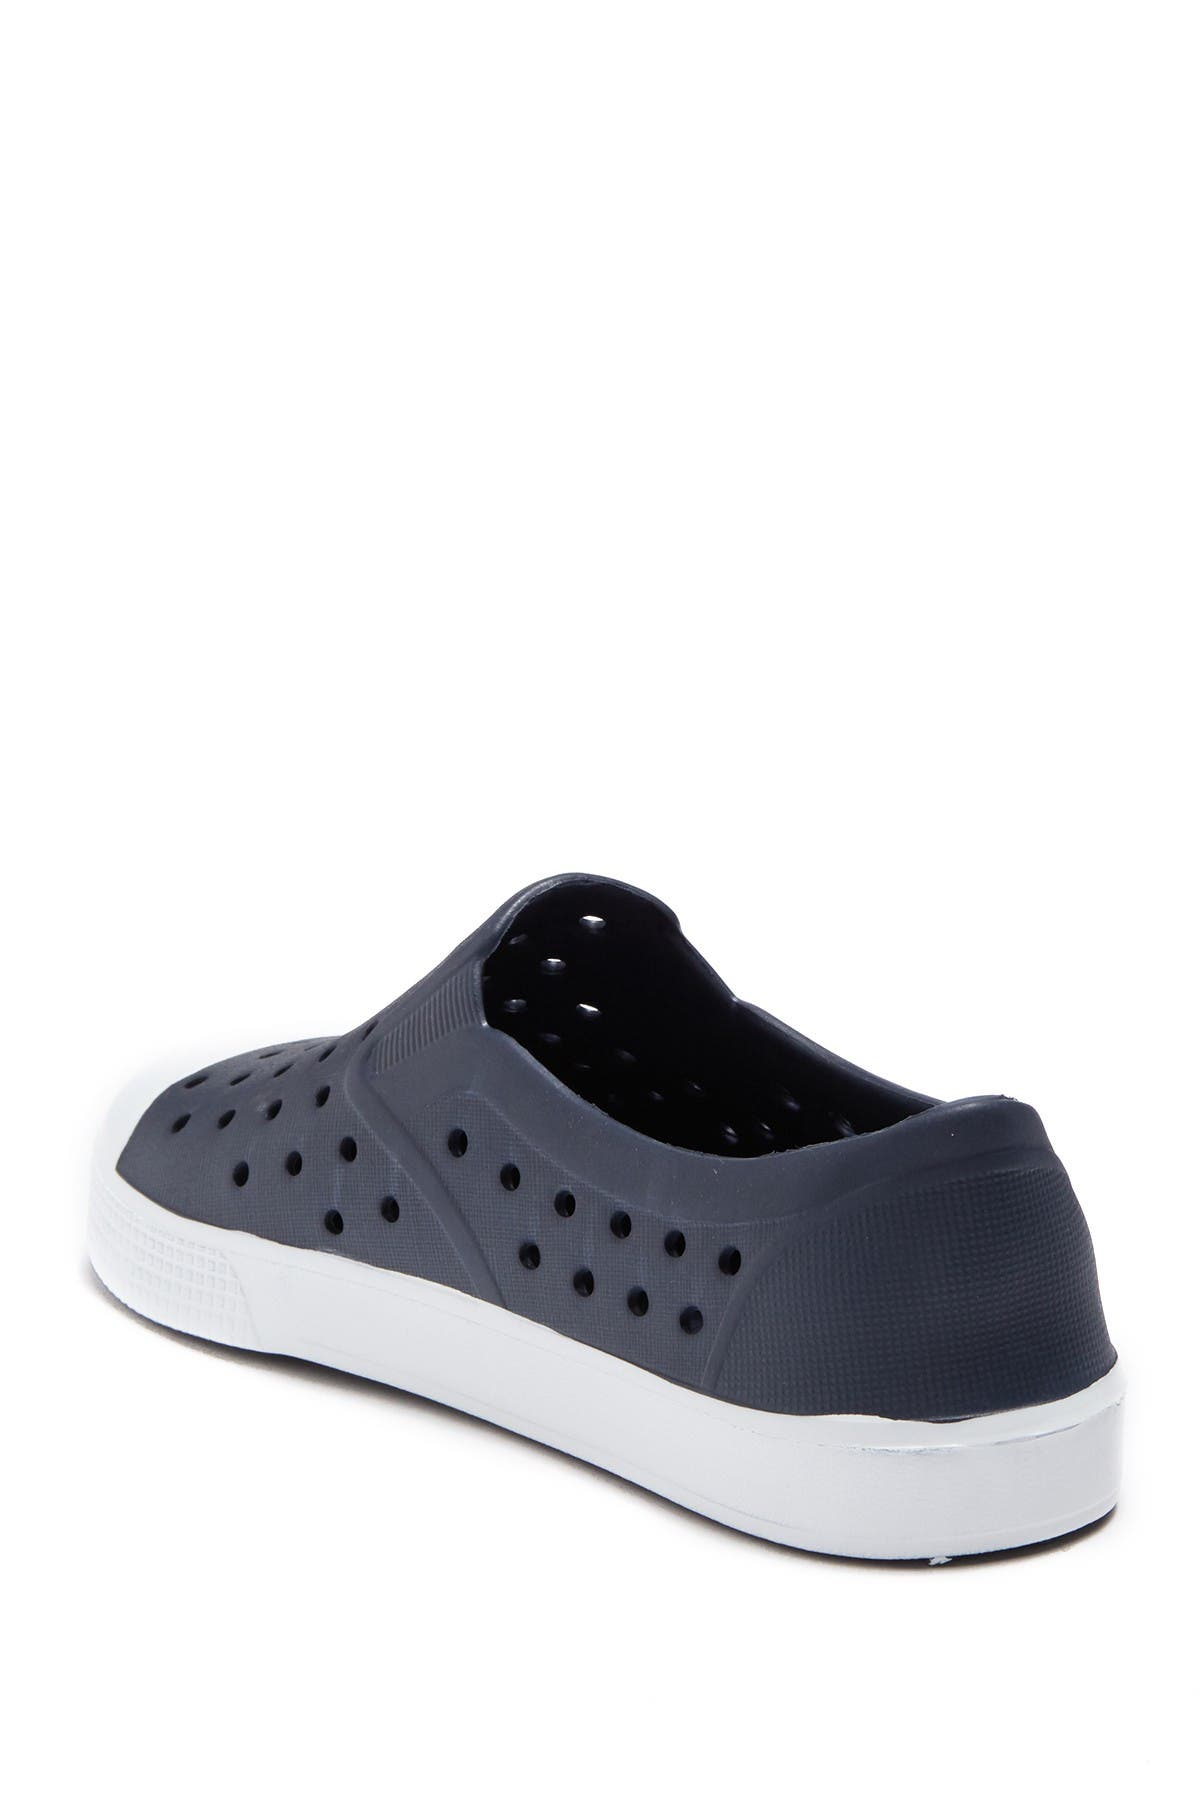 Image of Harper Canyon Eva Surfer Boy Perforated Slip-On Sneaker